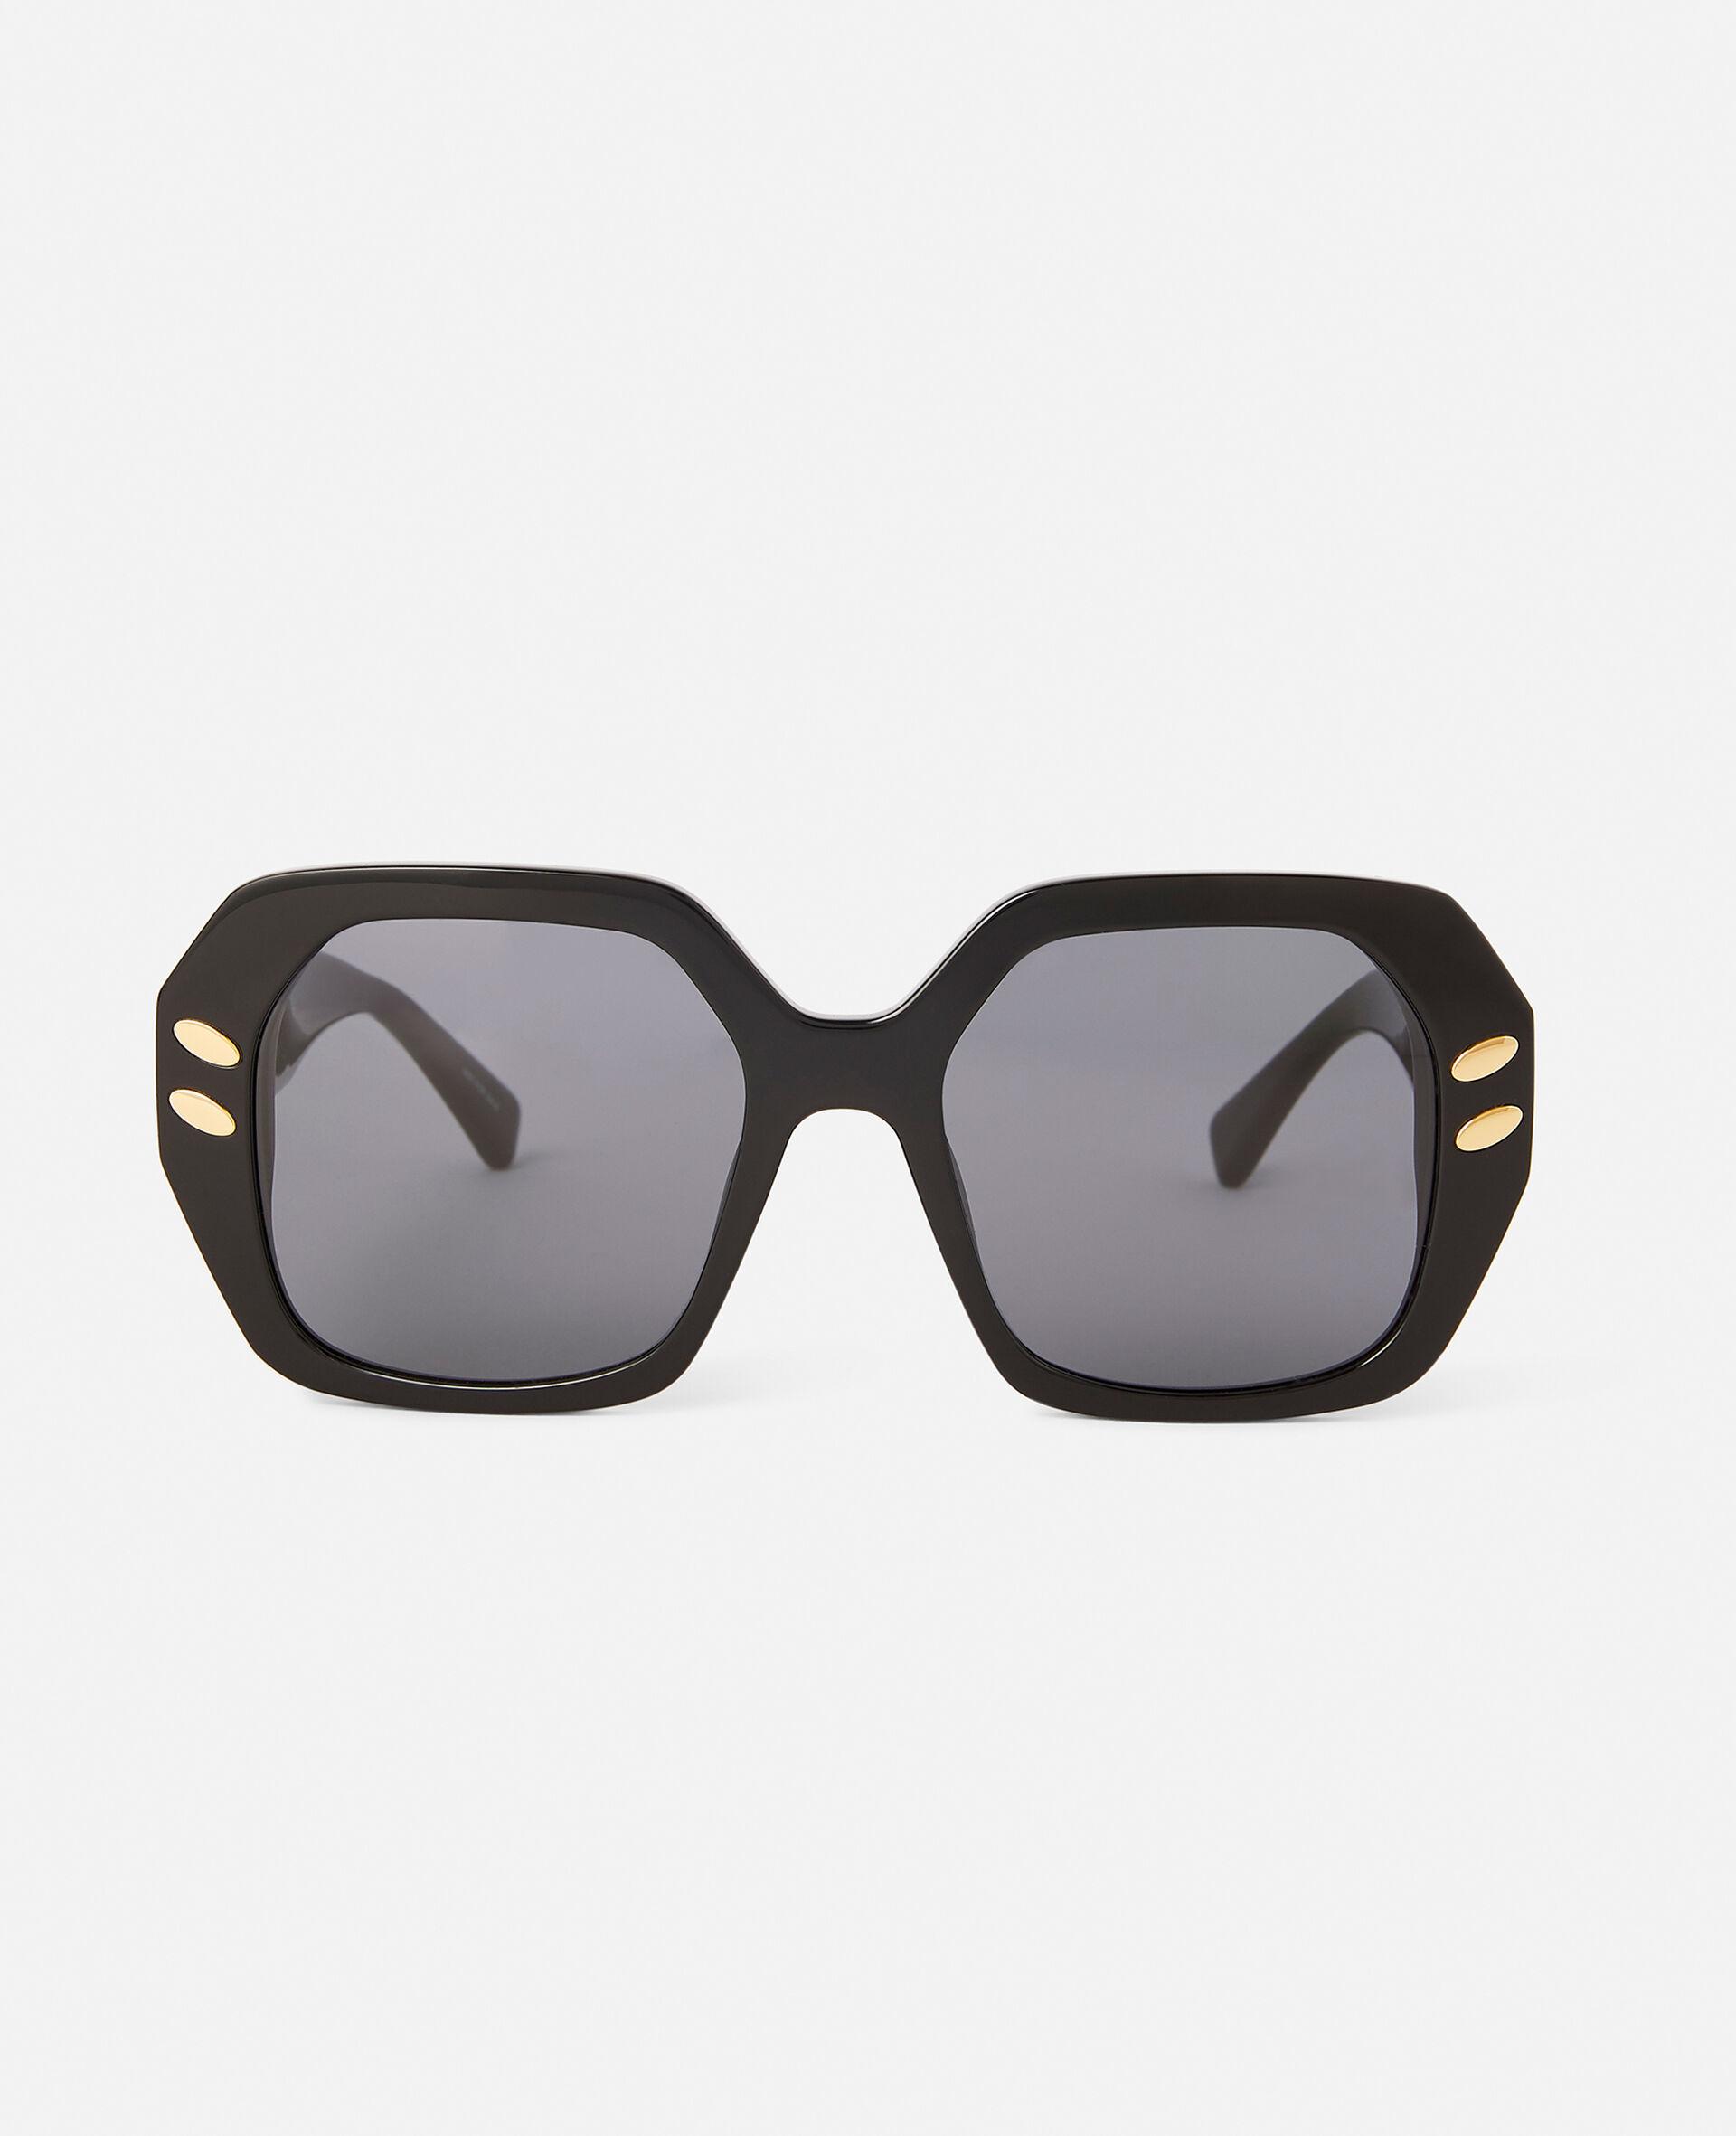 Brown Geometric Sunglasses-Brown-large image number 5